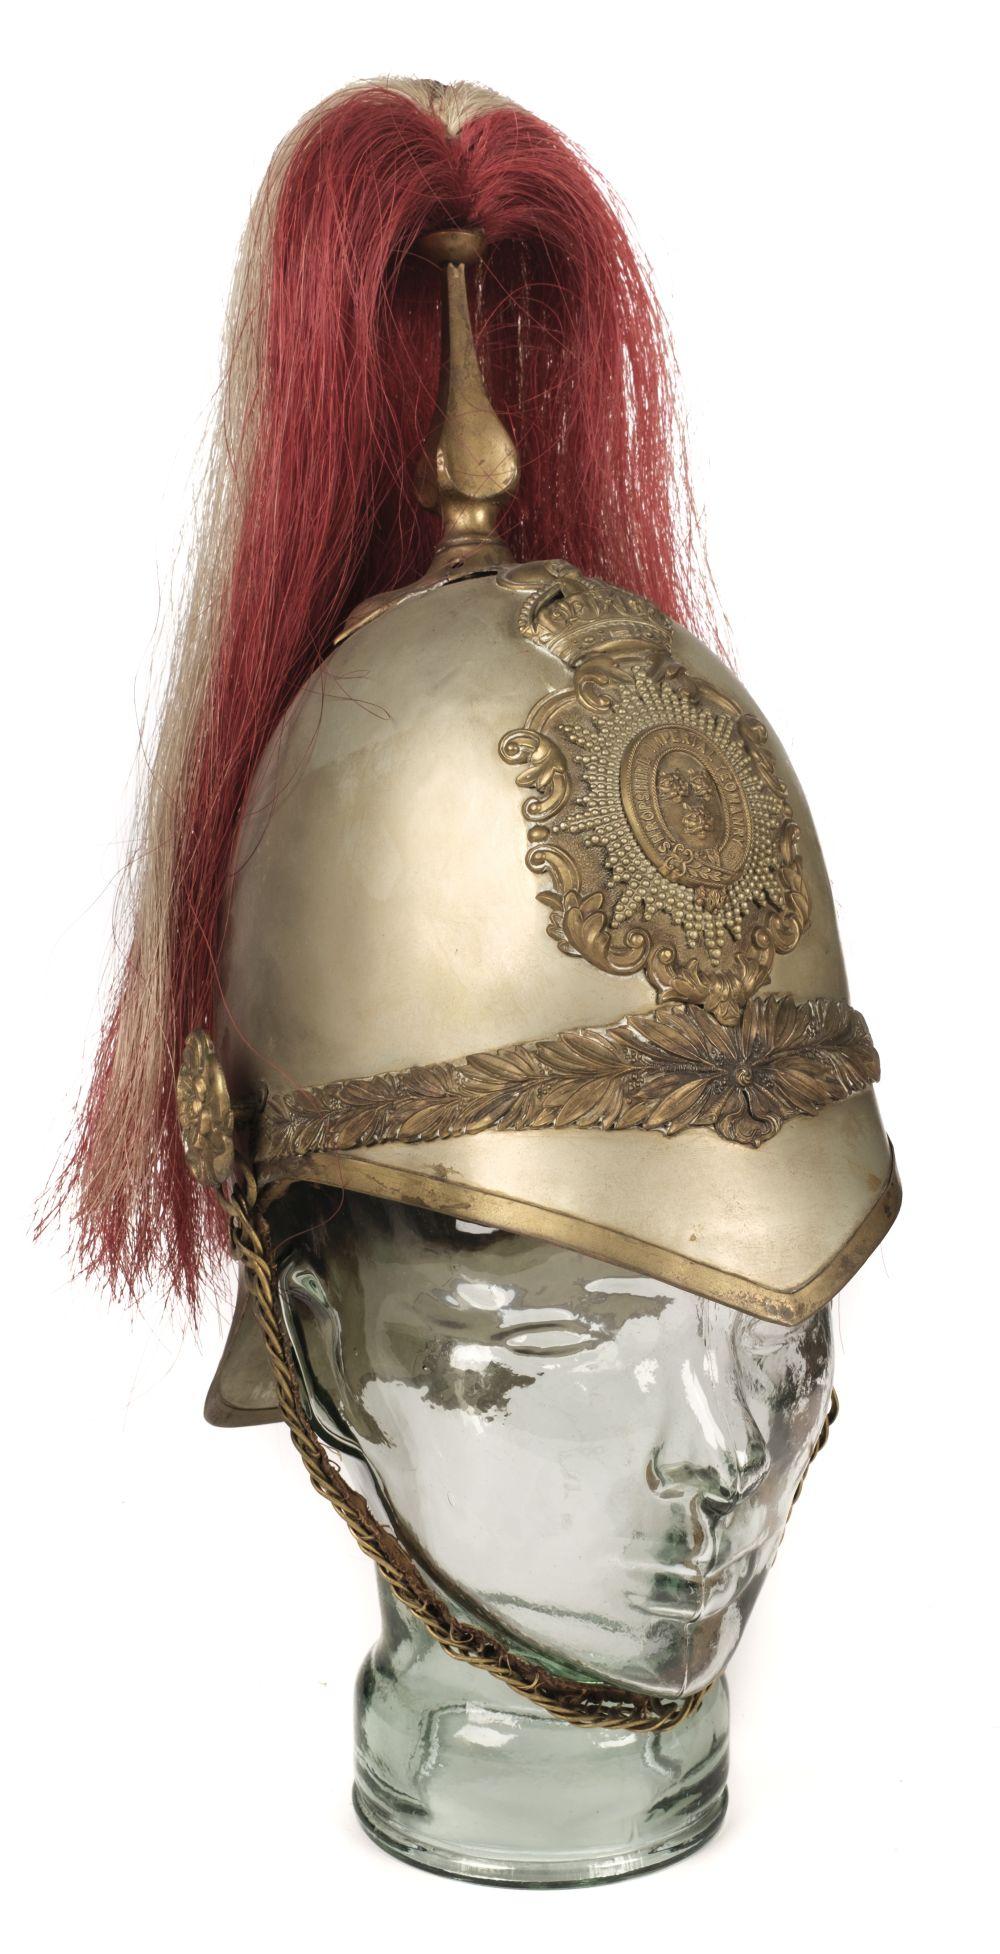 * Shropshire Yeomanry. An Edward VIII period helmet